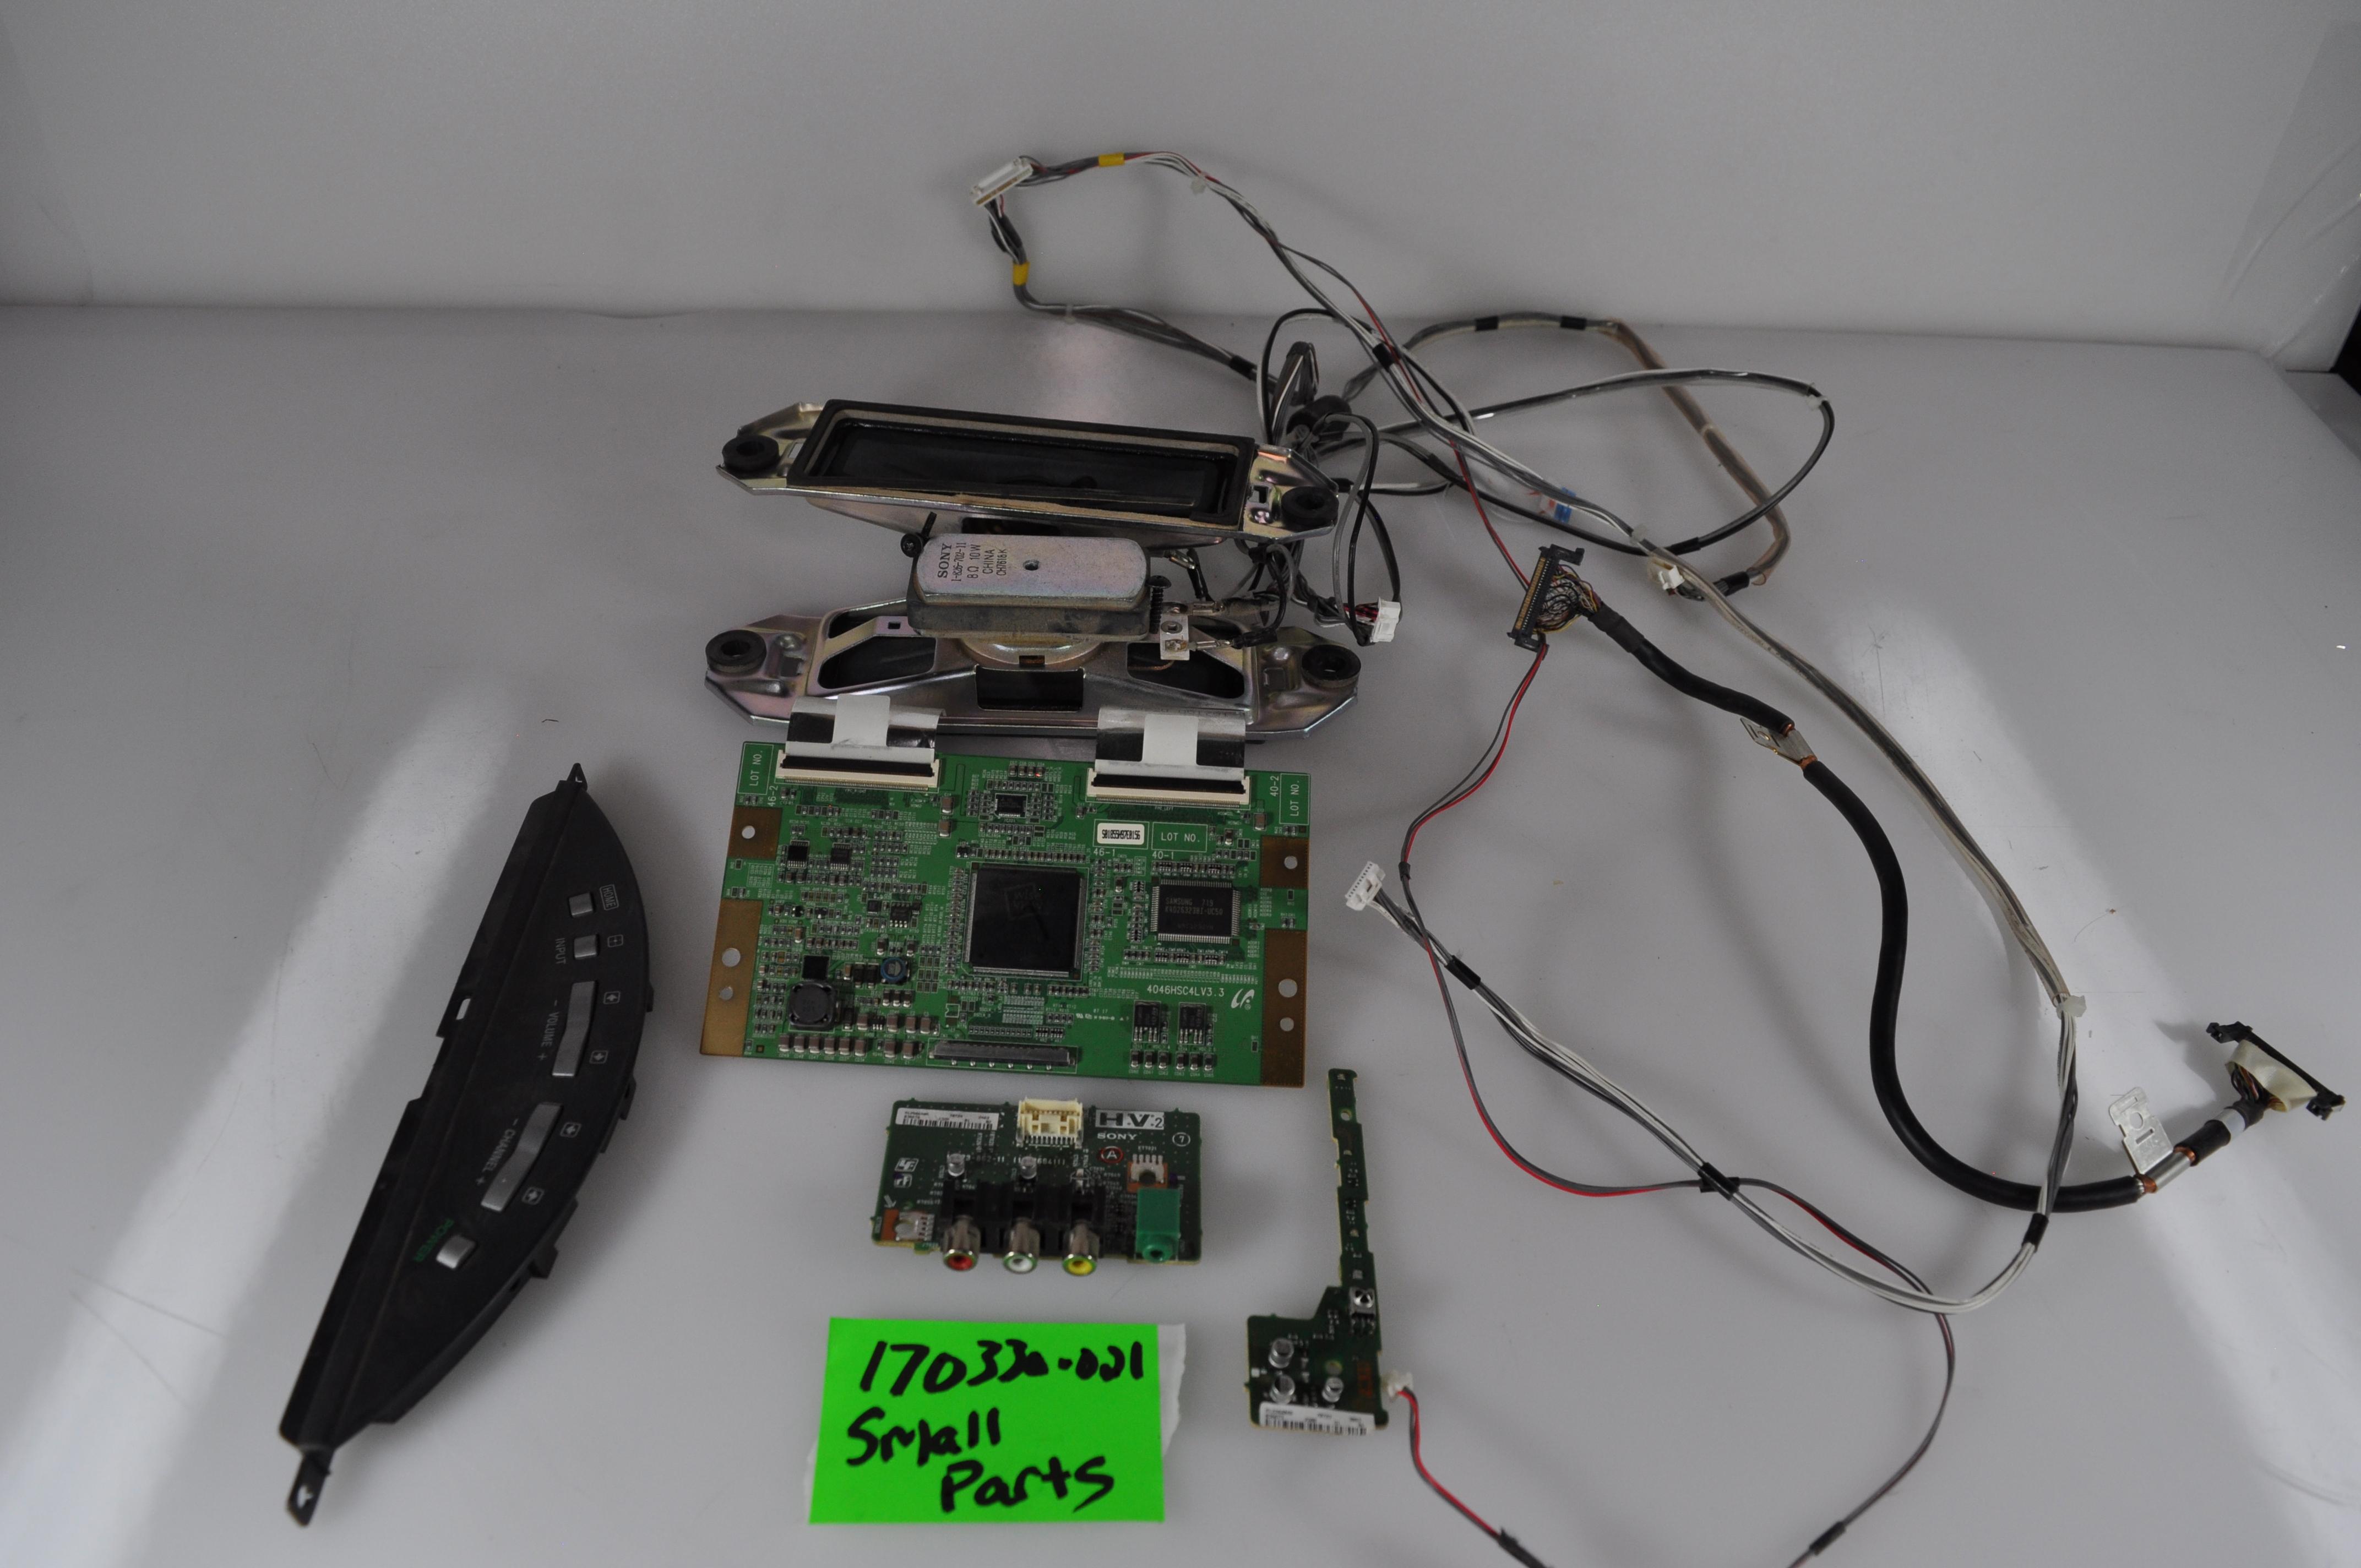 SONY KDL-46V3000 Small Parts Repair Kit SPEAKERS